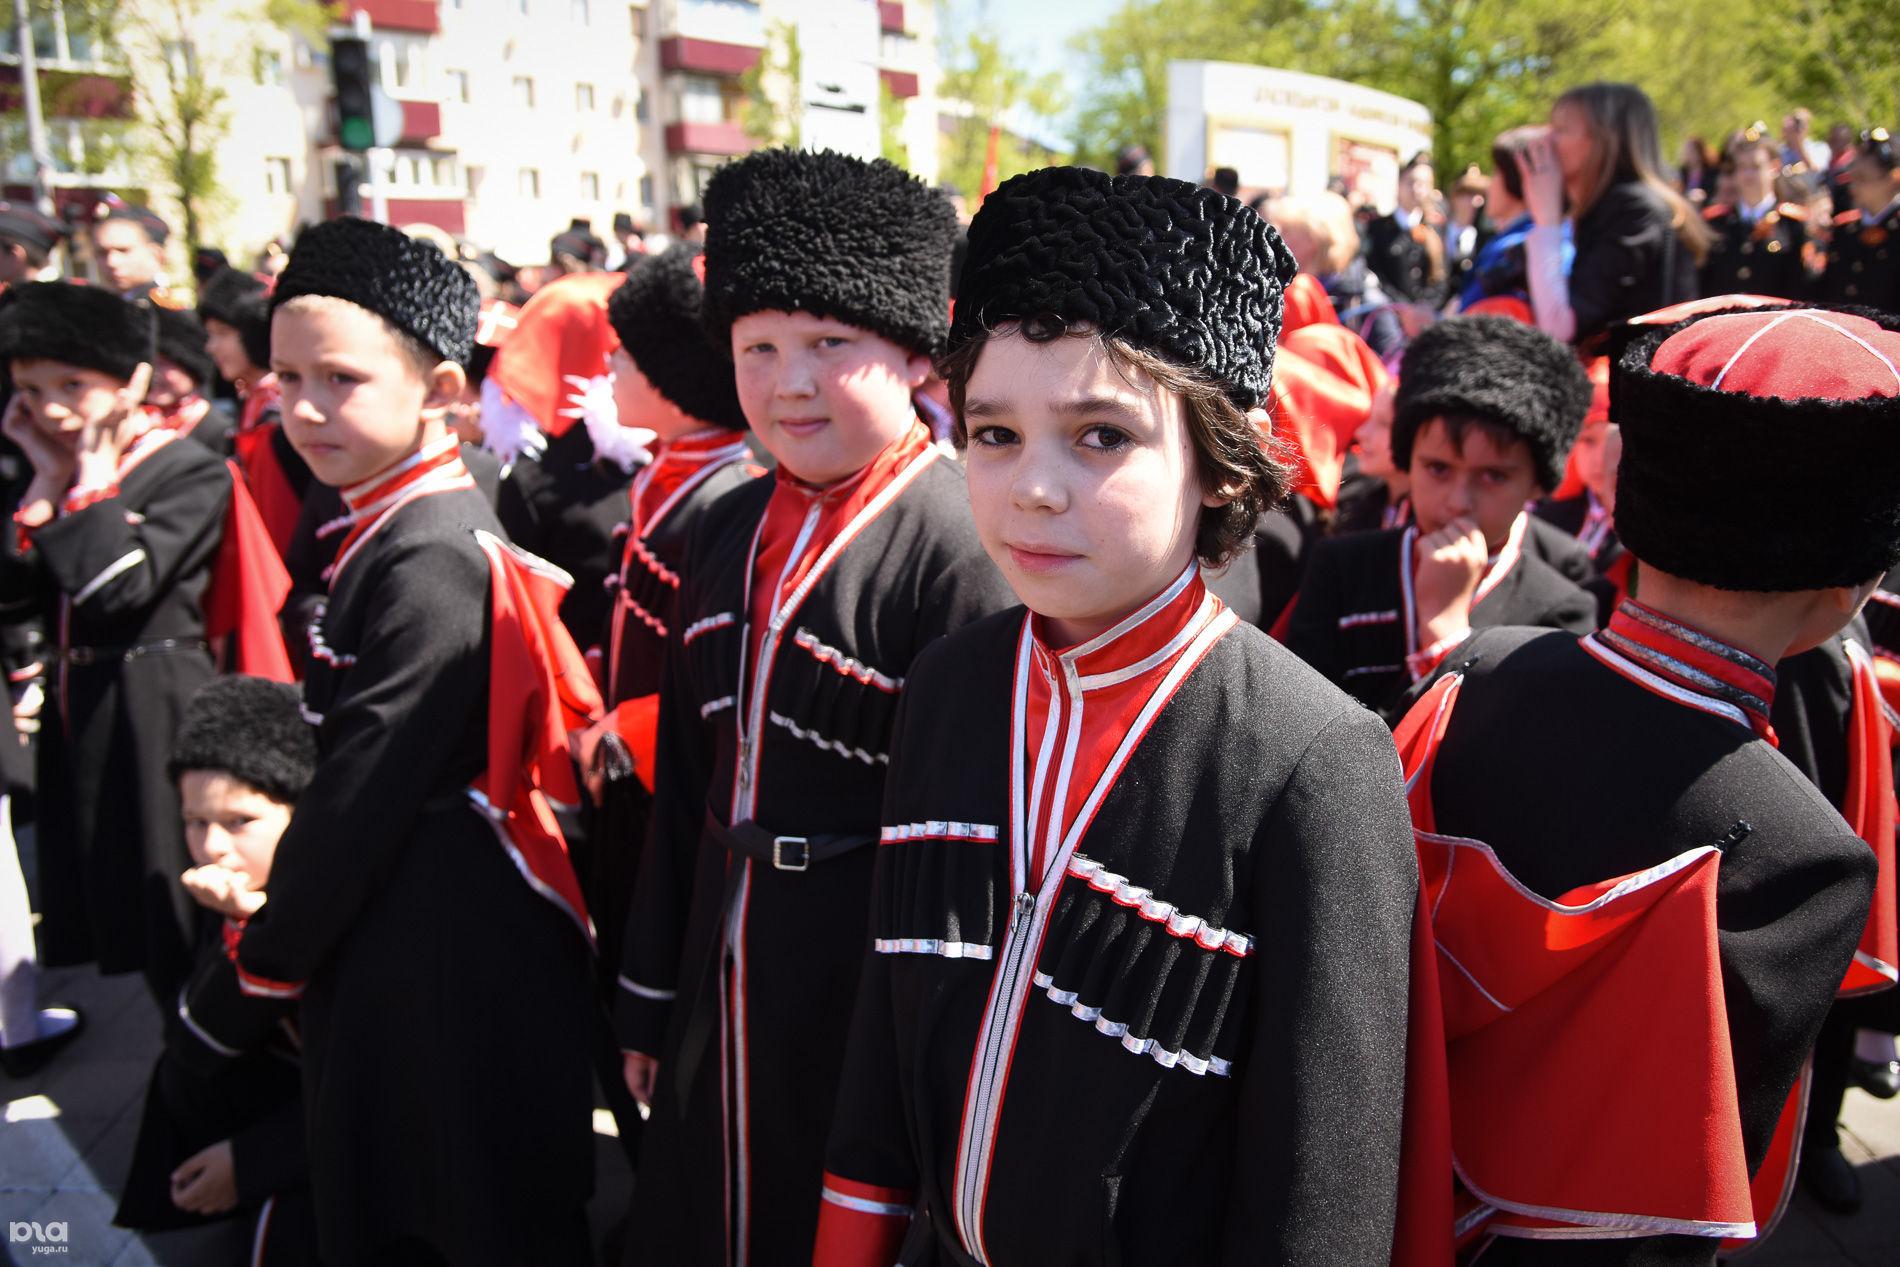 ©Парад казаков в Краснодаре Елена Синеок, ЮГА.ру